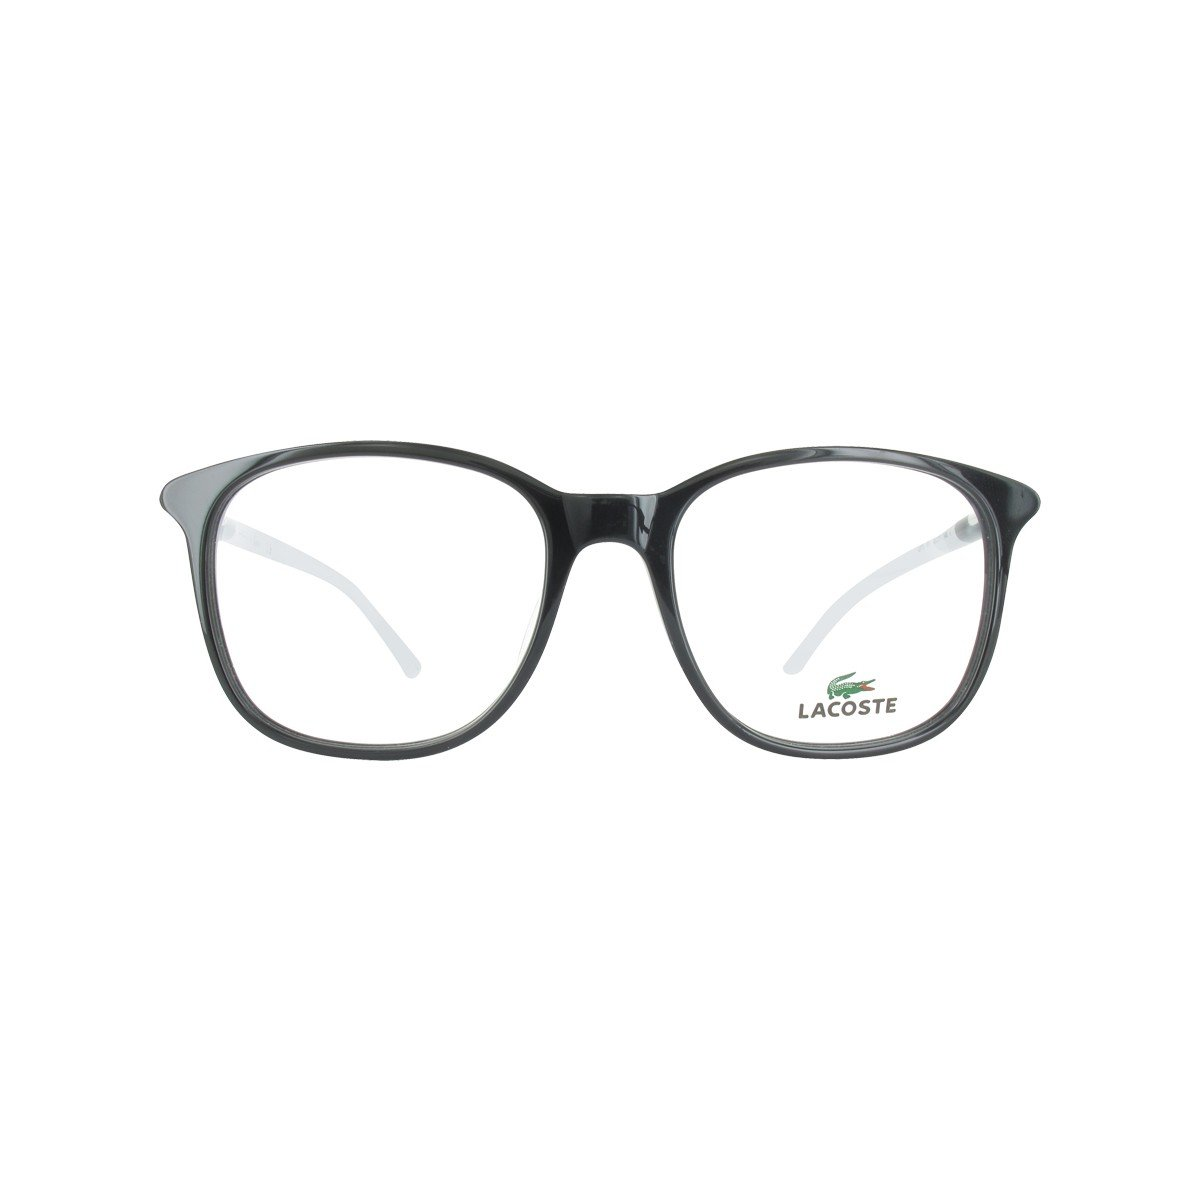 Eyeglasses LACOSTE L2770 001 BLACK